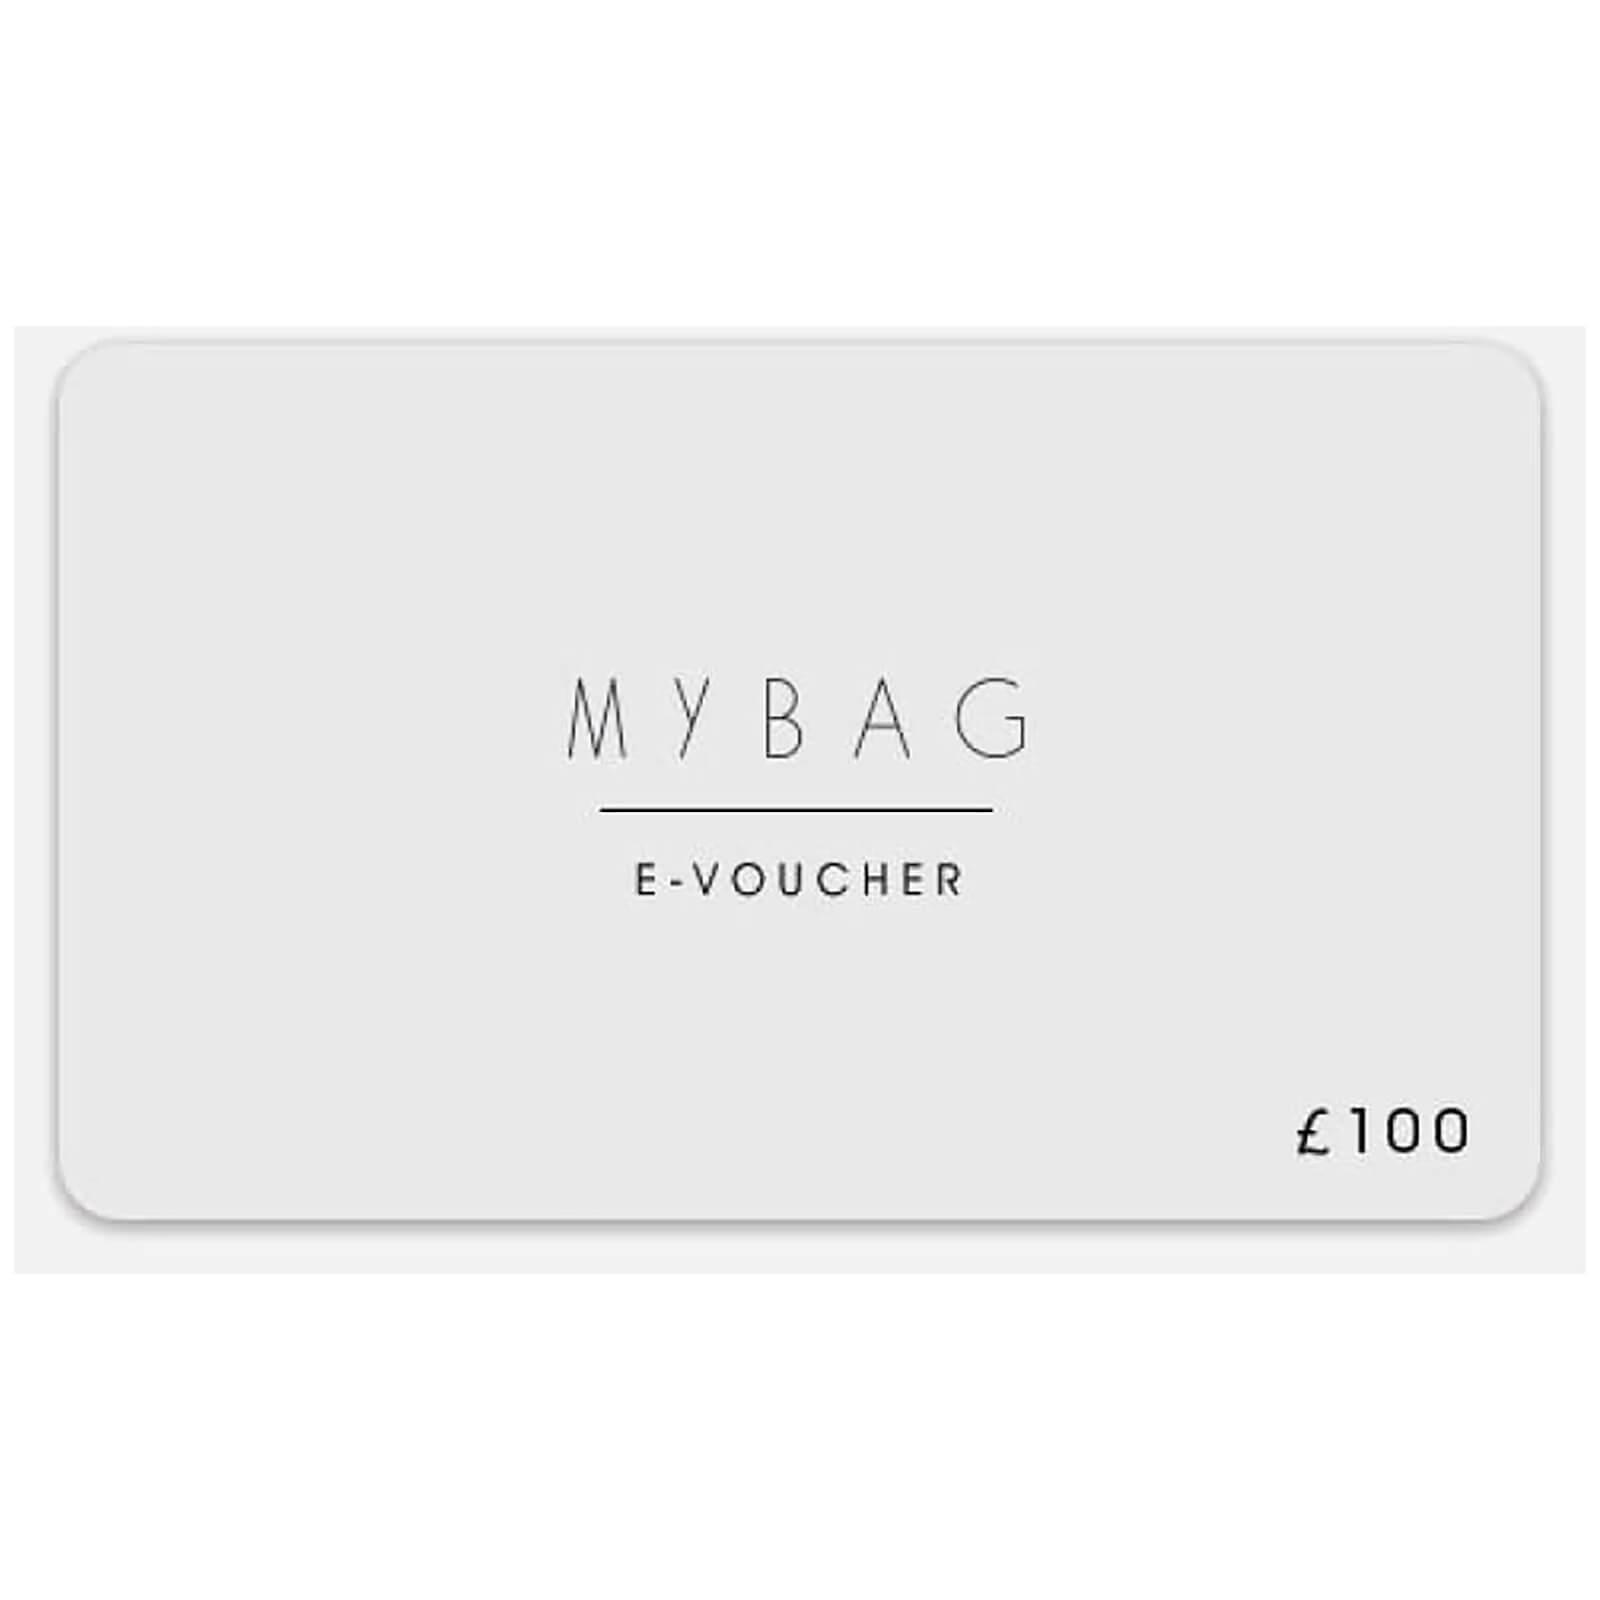 £100 MyBag Gift Voucher